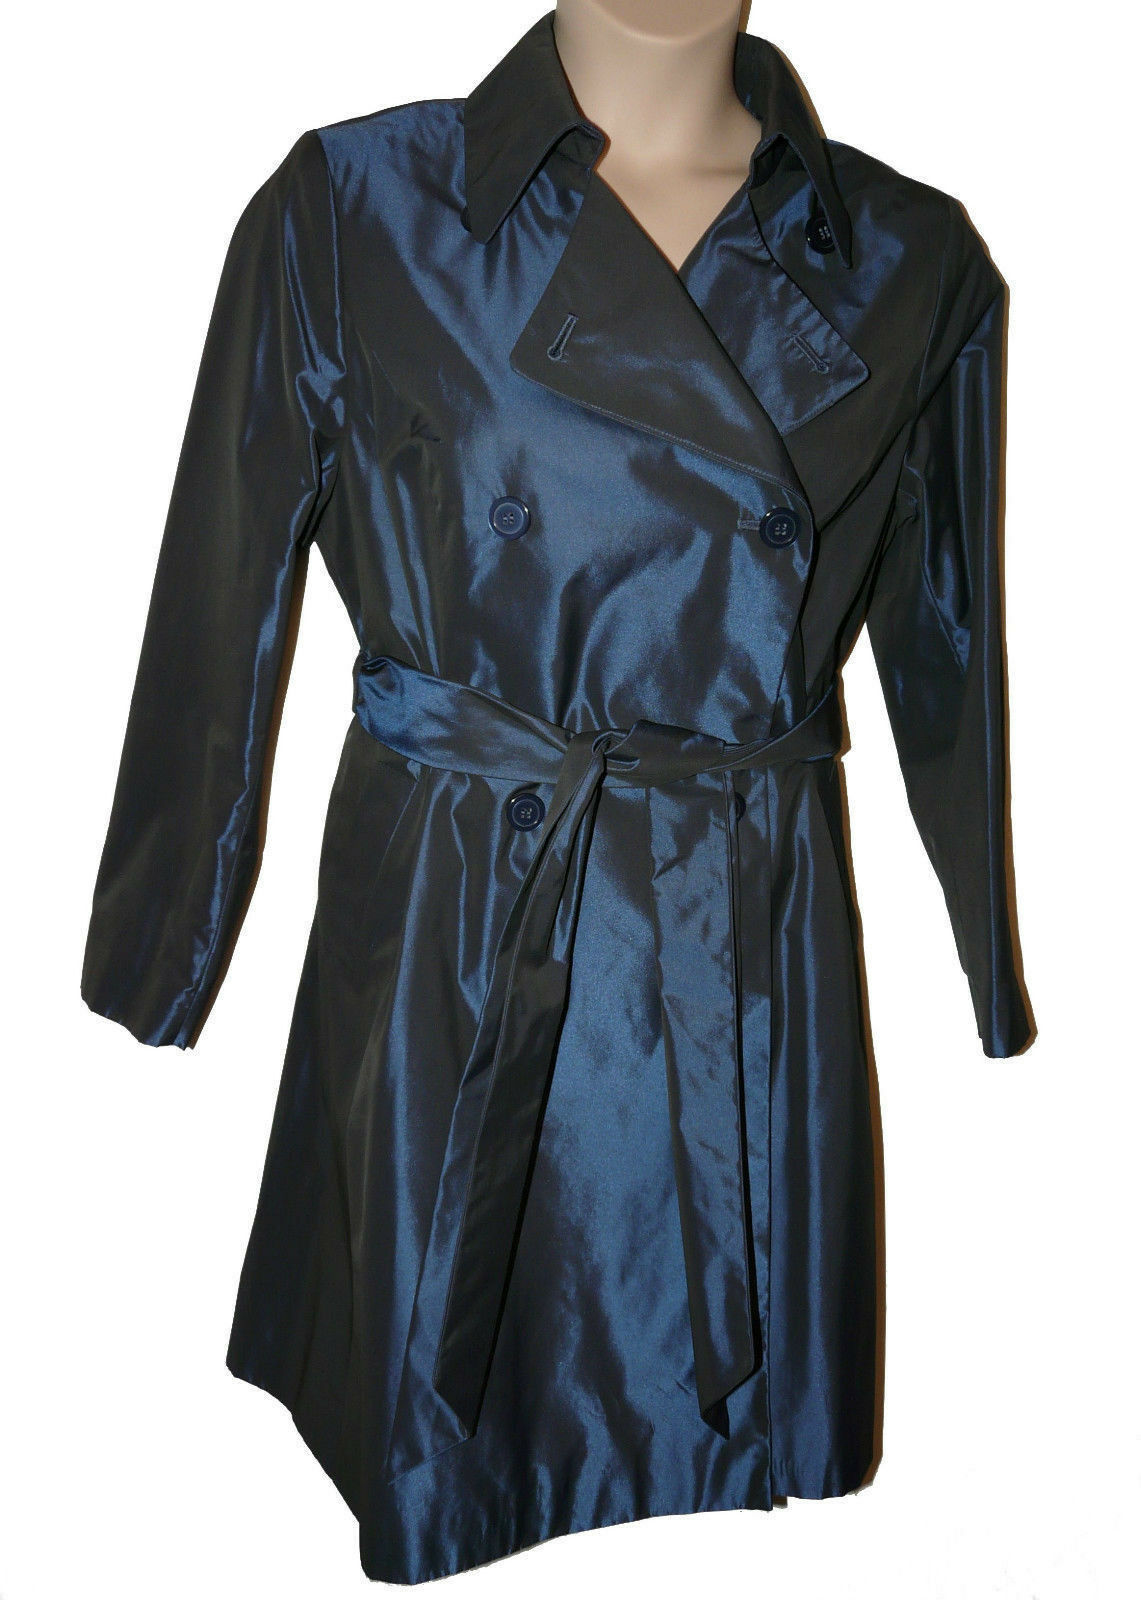 BNWT size 16  TWIGGY for M&S WOMAN NAVY TAFFETA Ladies COAT MAC